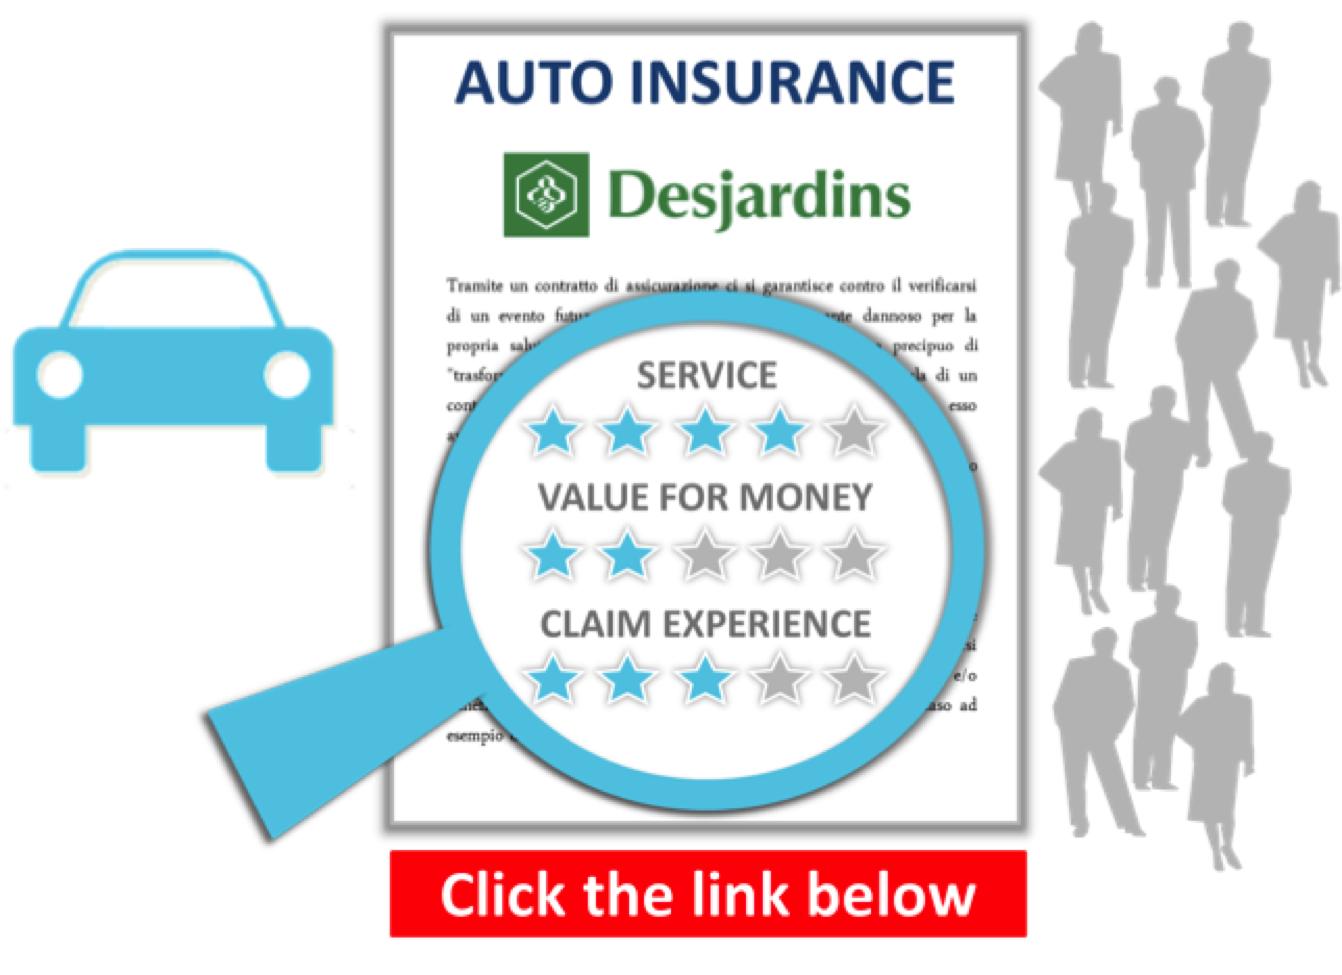 independent consumer reviews for desjardins auto insurance. Black Bedroom Furniture Sets. Home Design Ideas